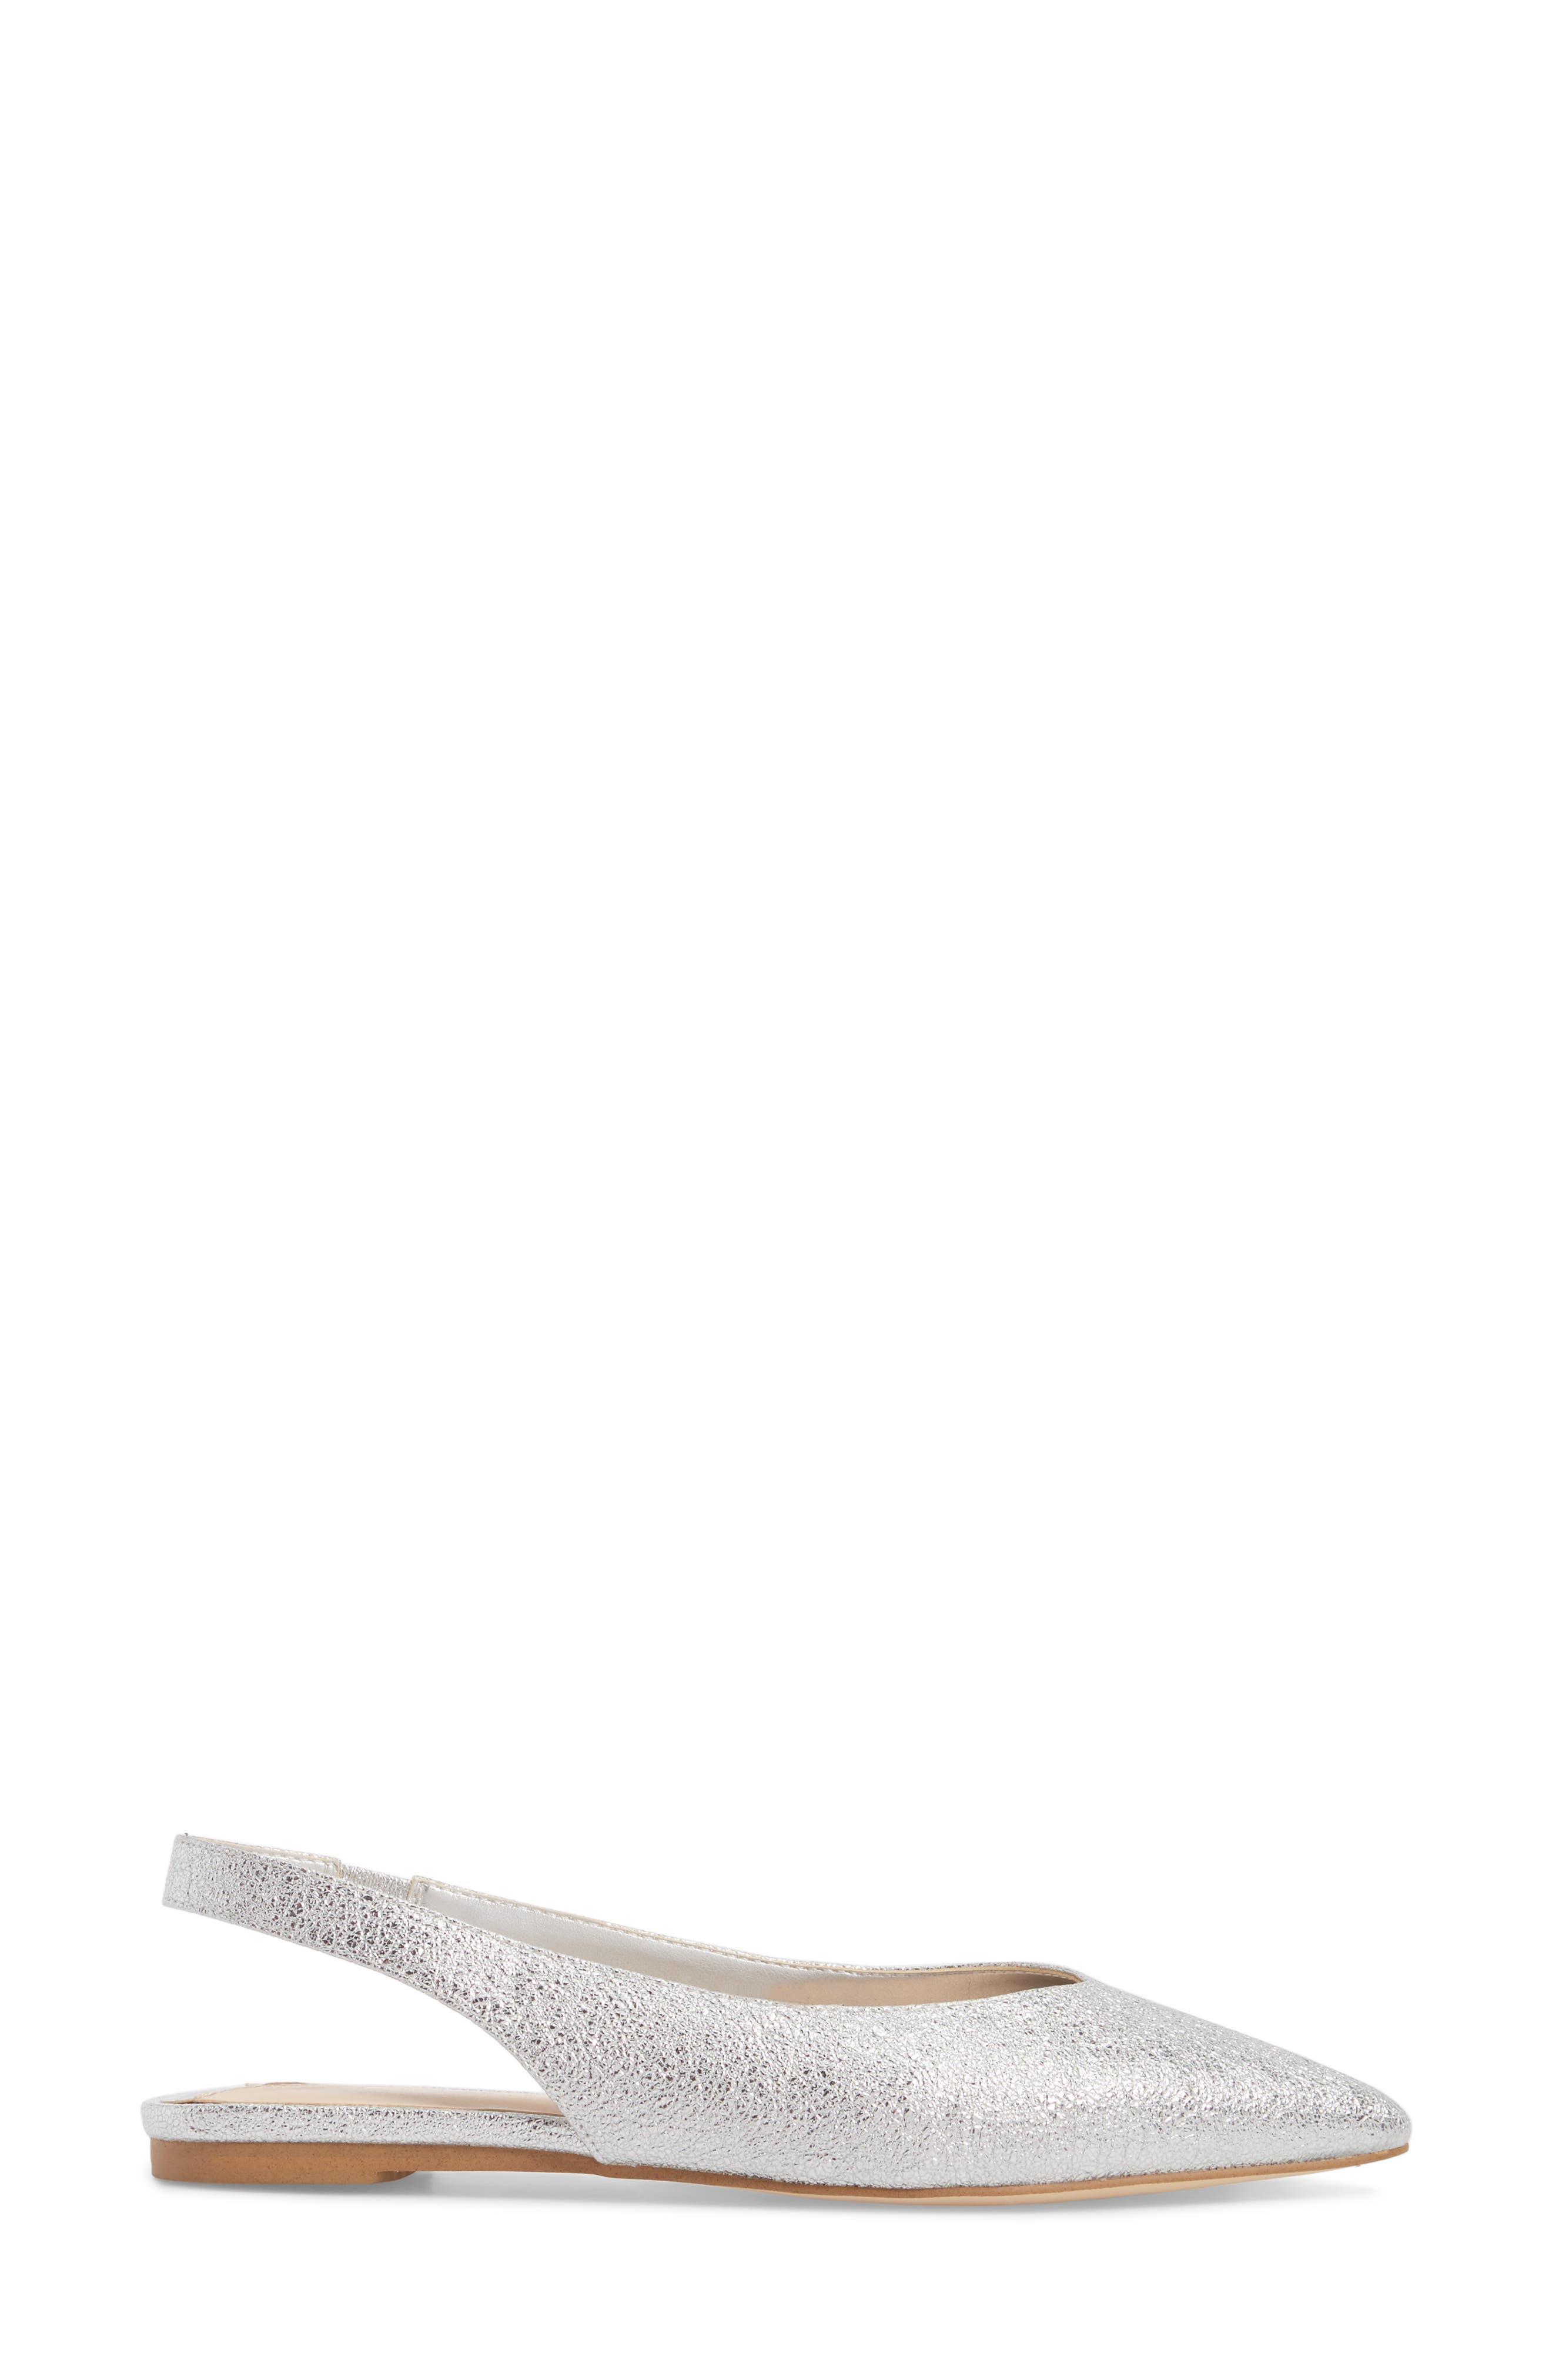 Masonn Slingback Flat,                             Alternate thumbnail 3, color,                             Silver Crackle Faux Leather